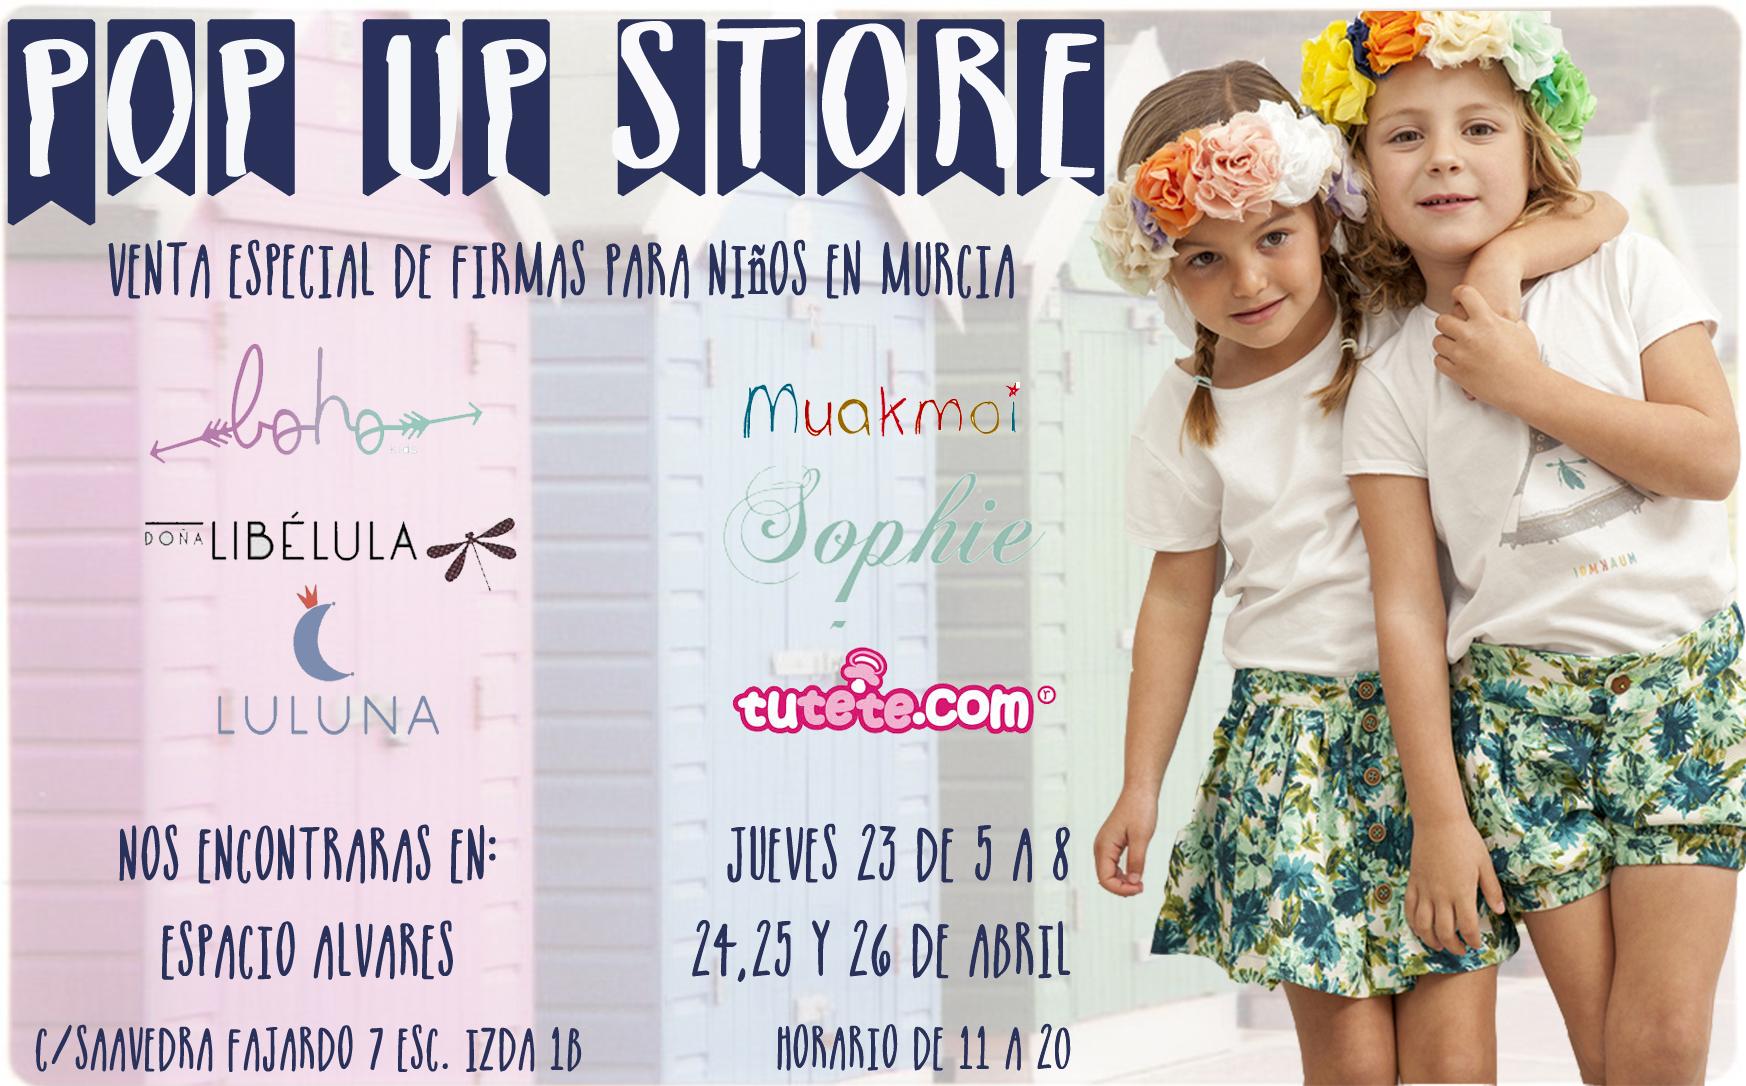 Pop Up Store Niños - Murcia